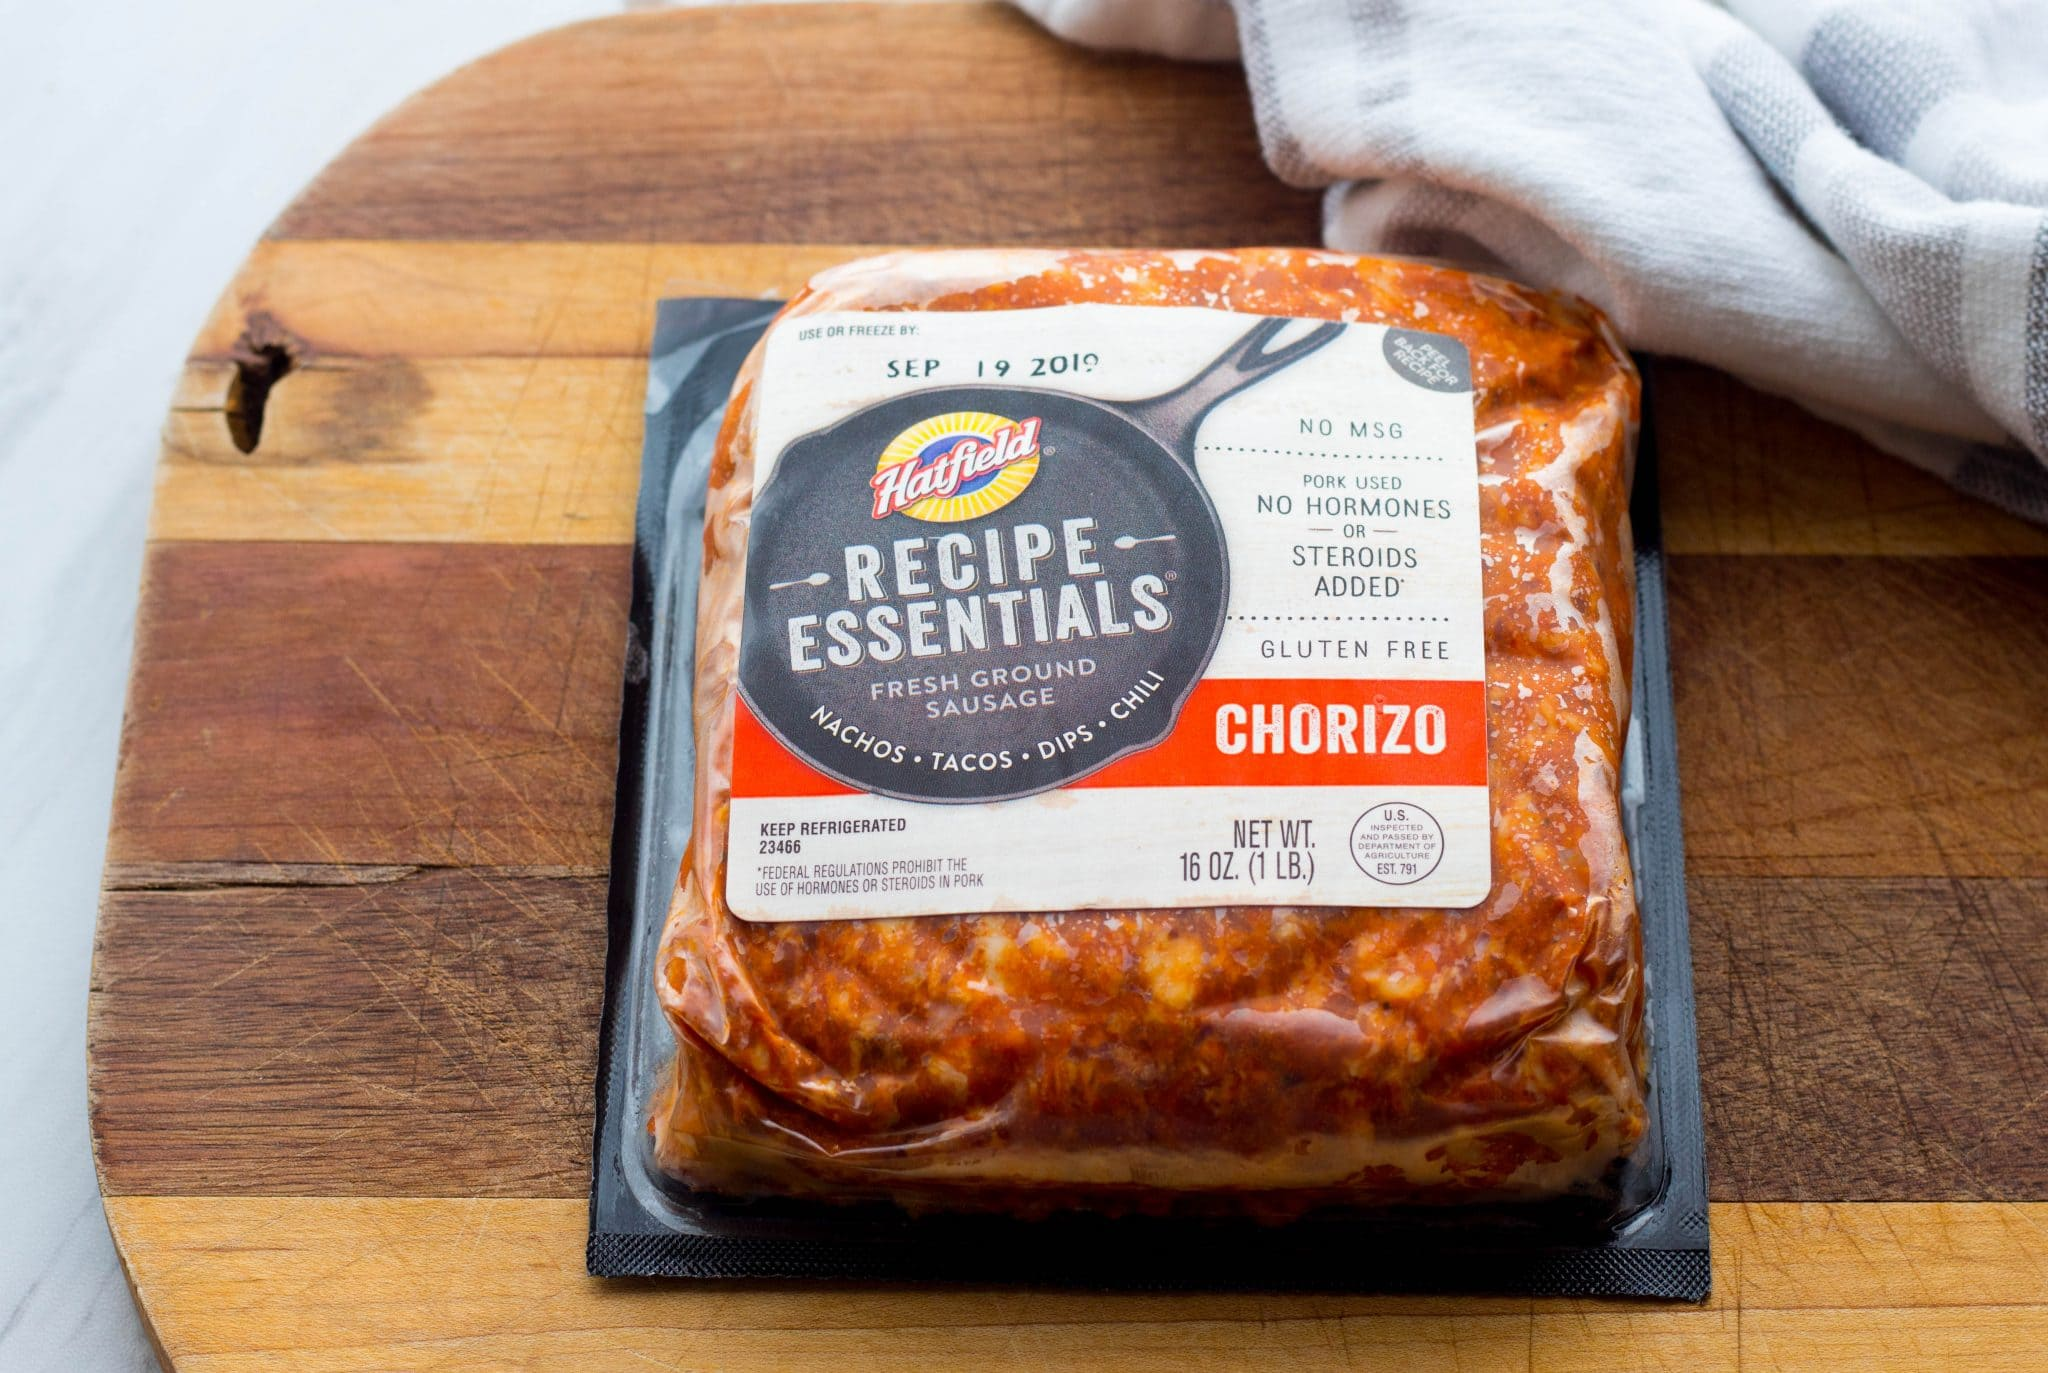 Hatfield Recipe Essentials Chorizo Sausage